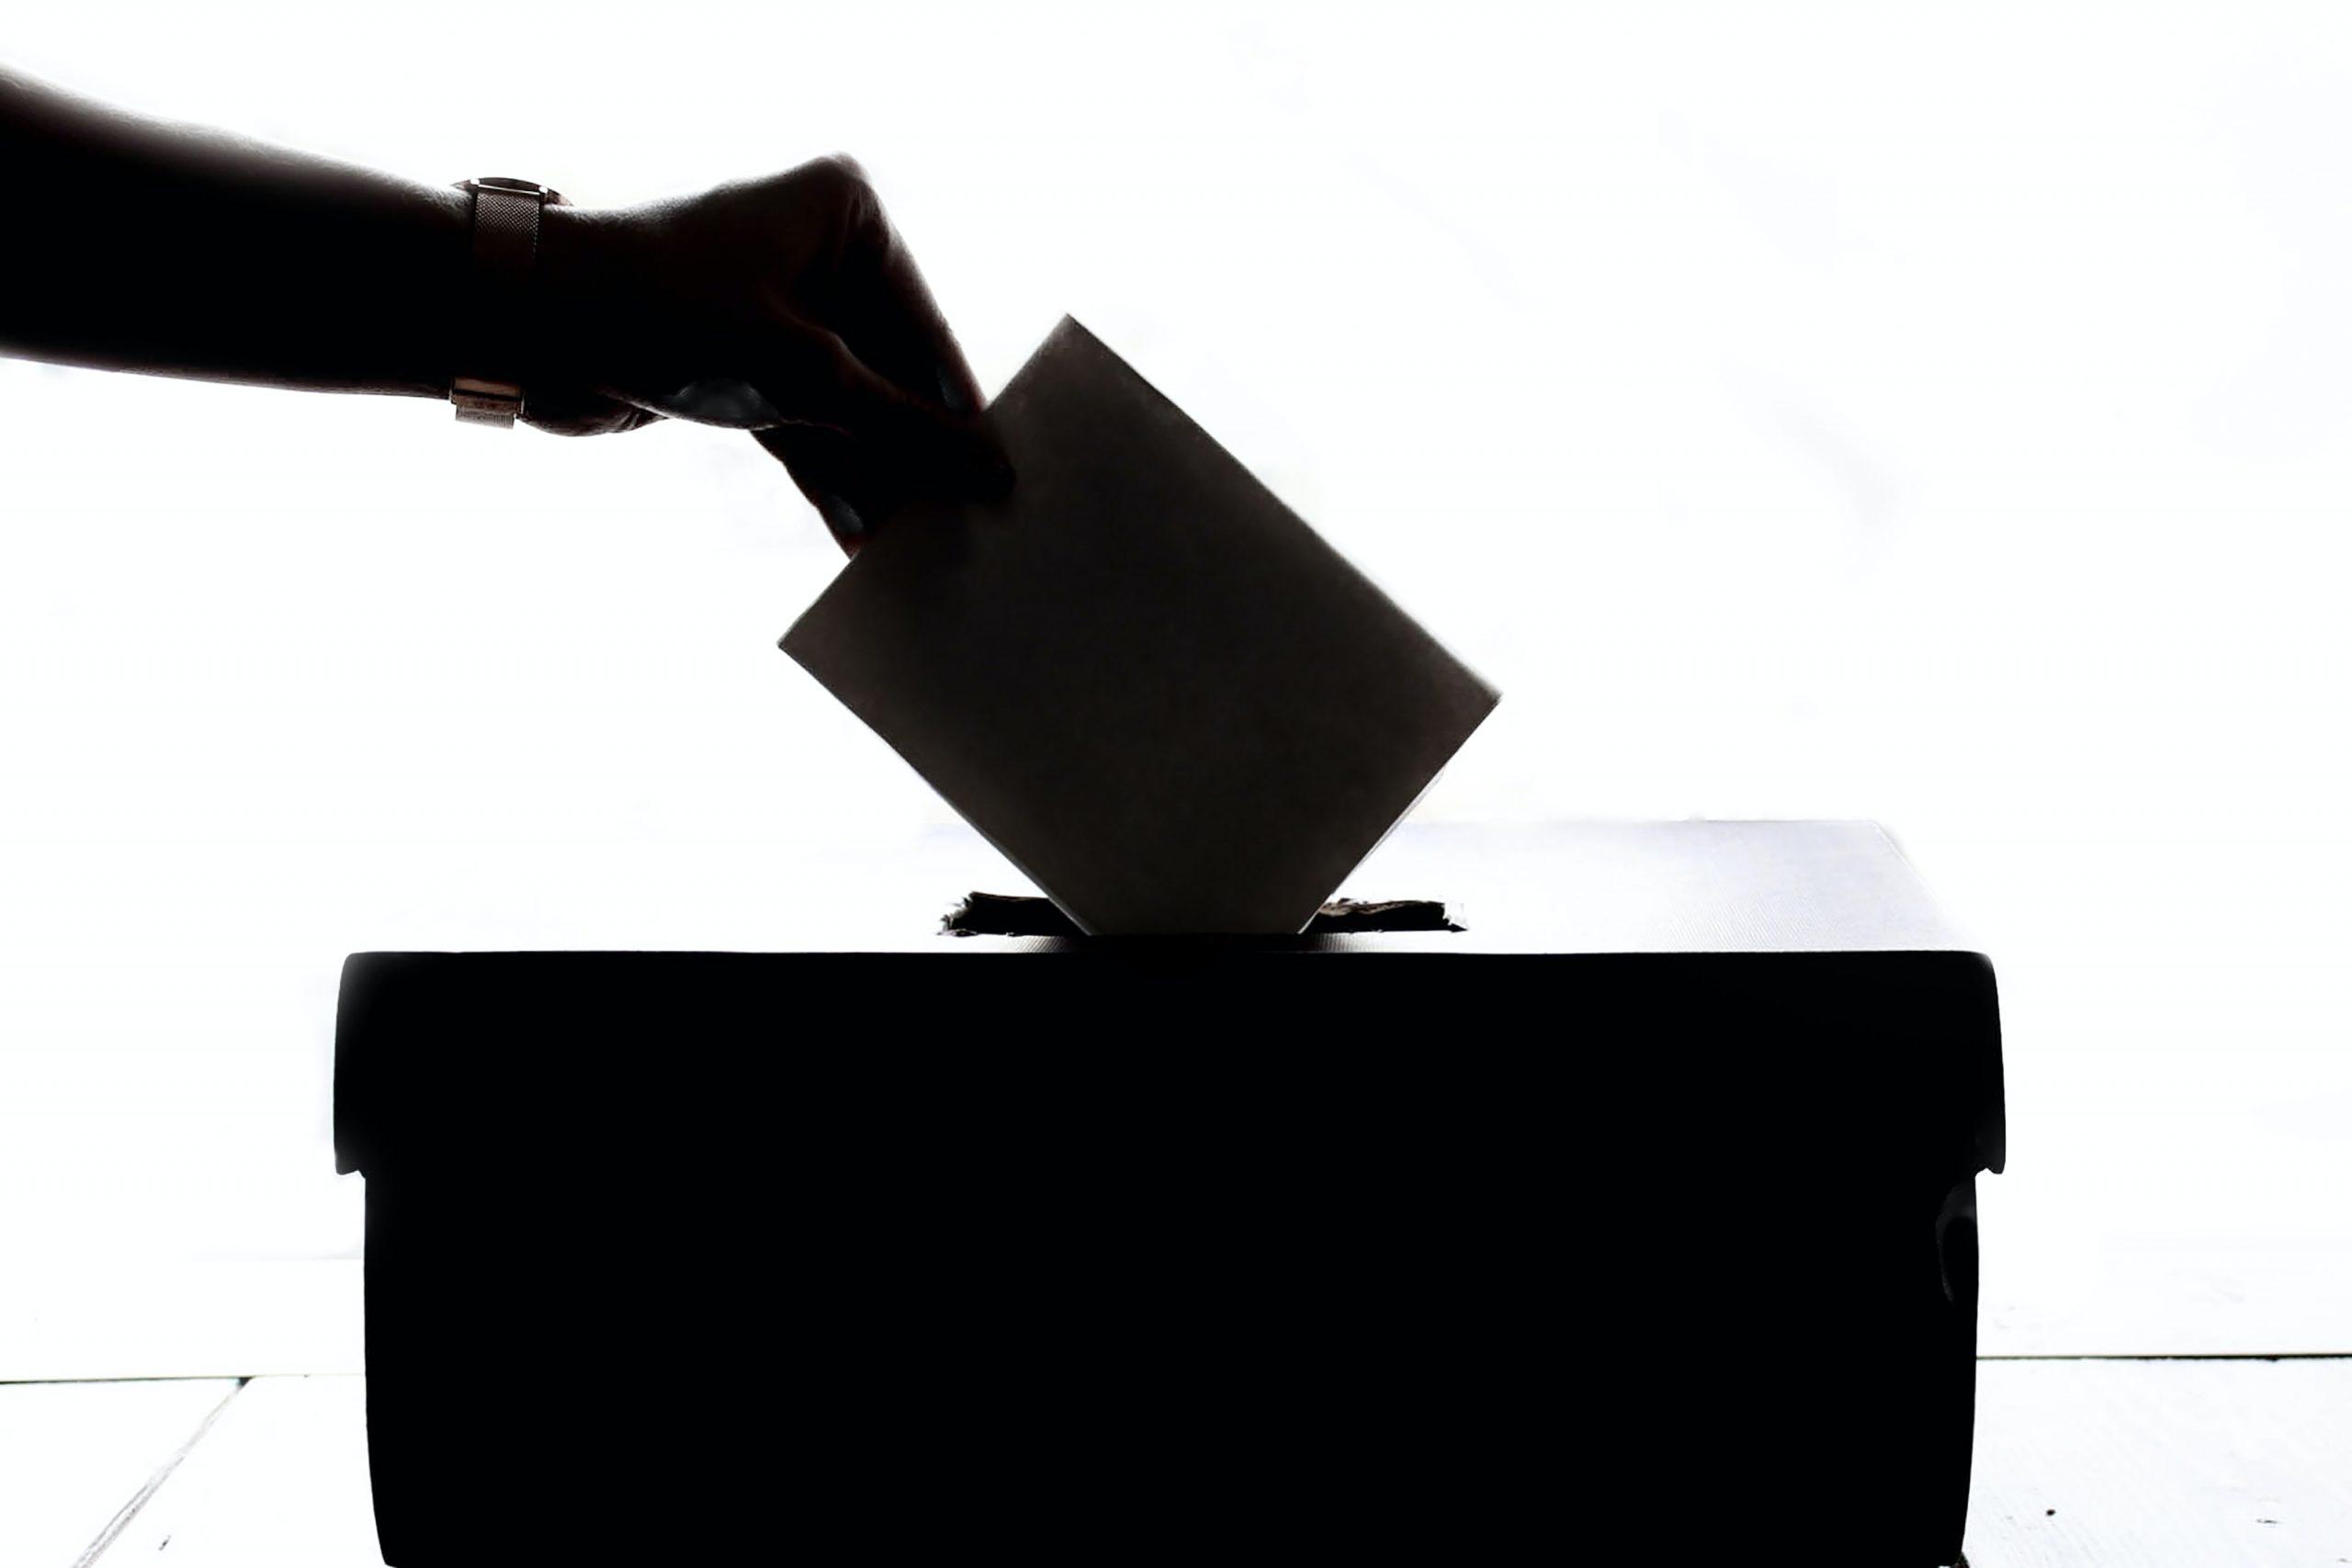 person voting silhouette